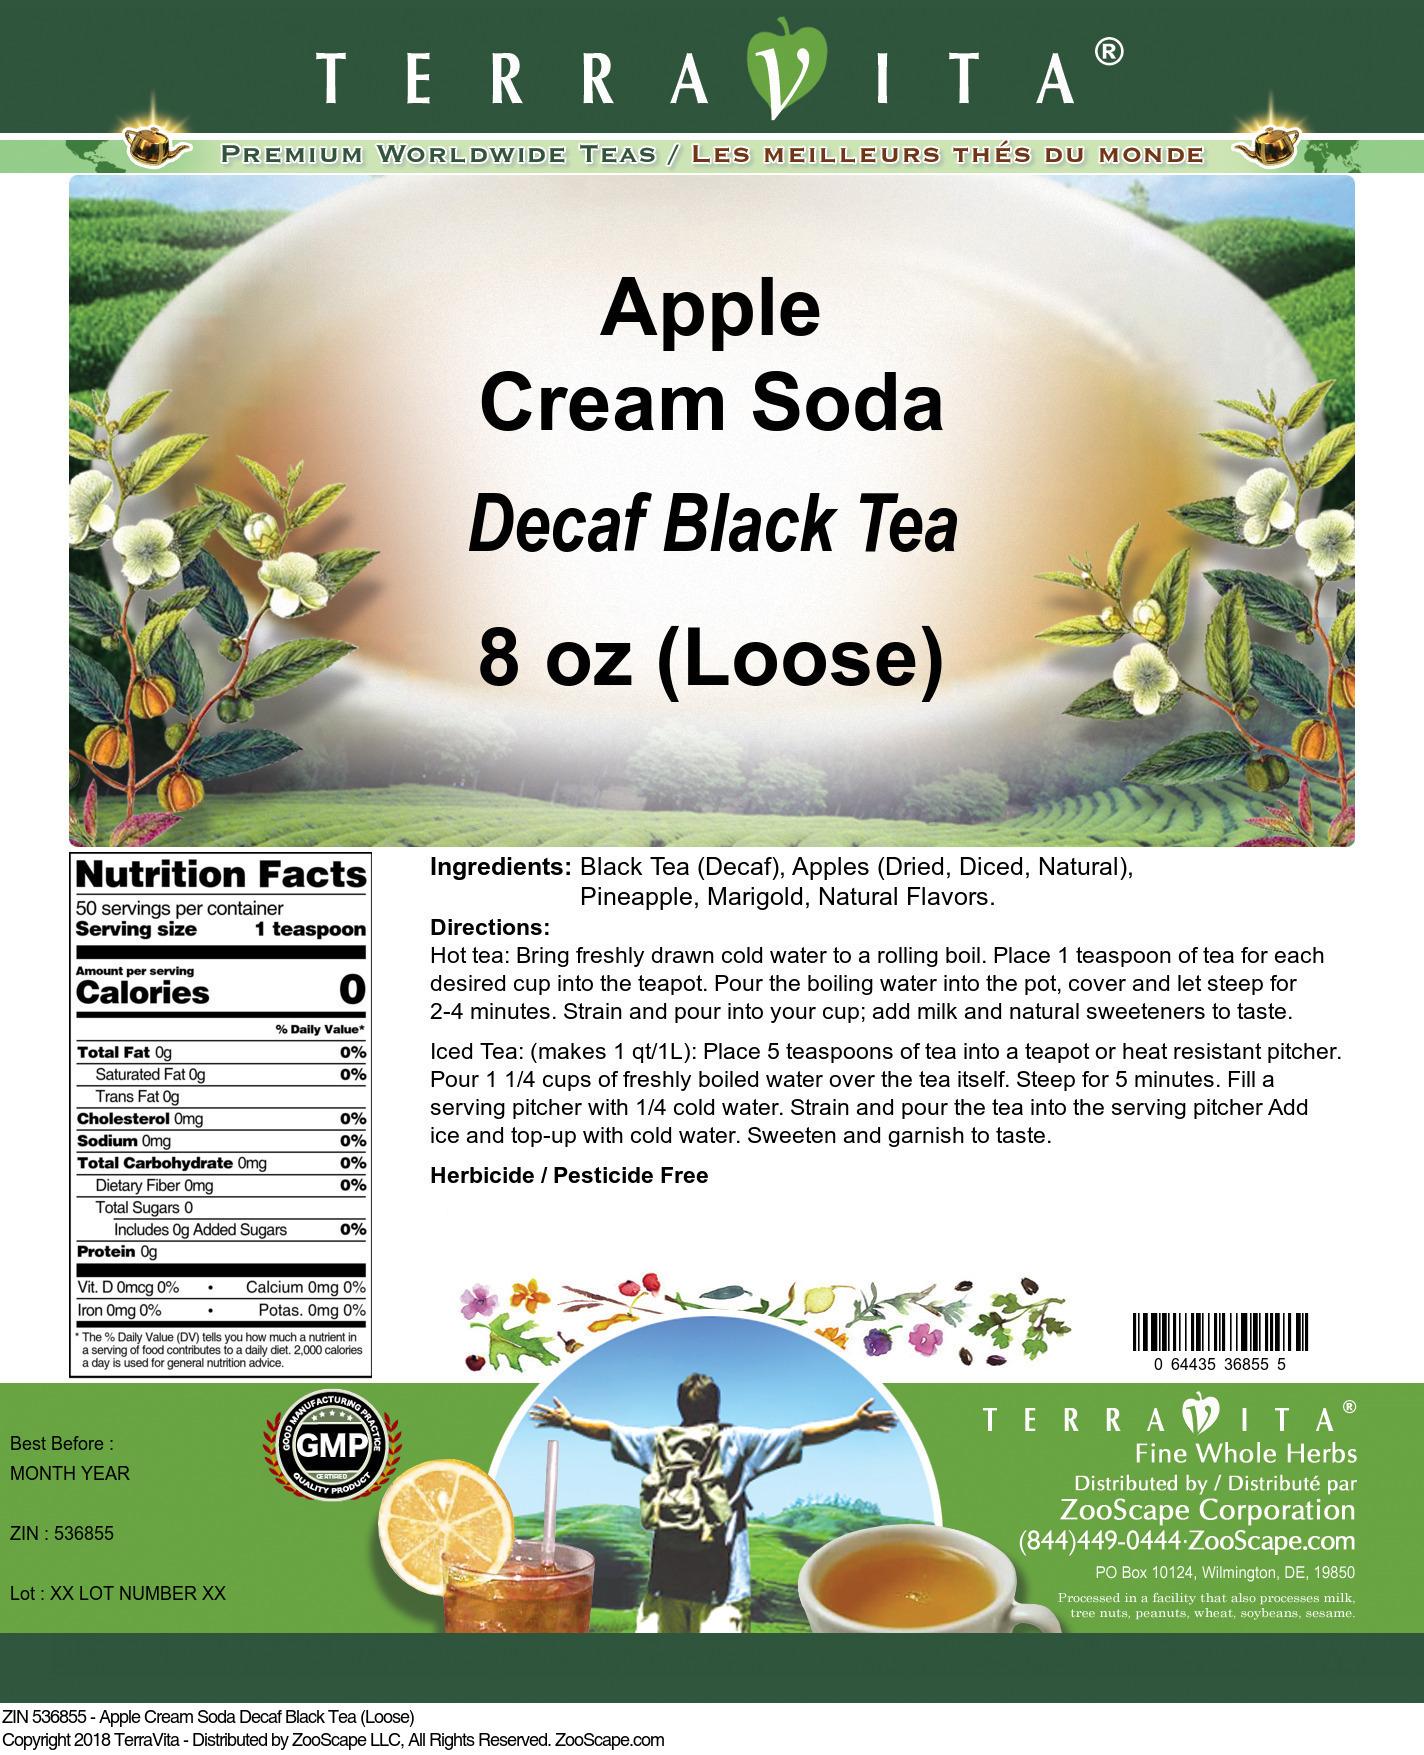 Apple Cream Soda Decaf Black Tea (Loose)